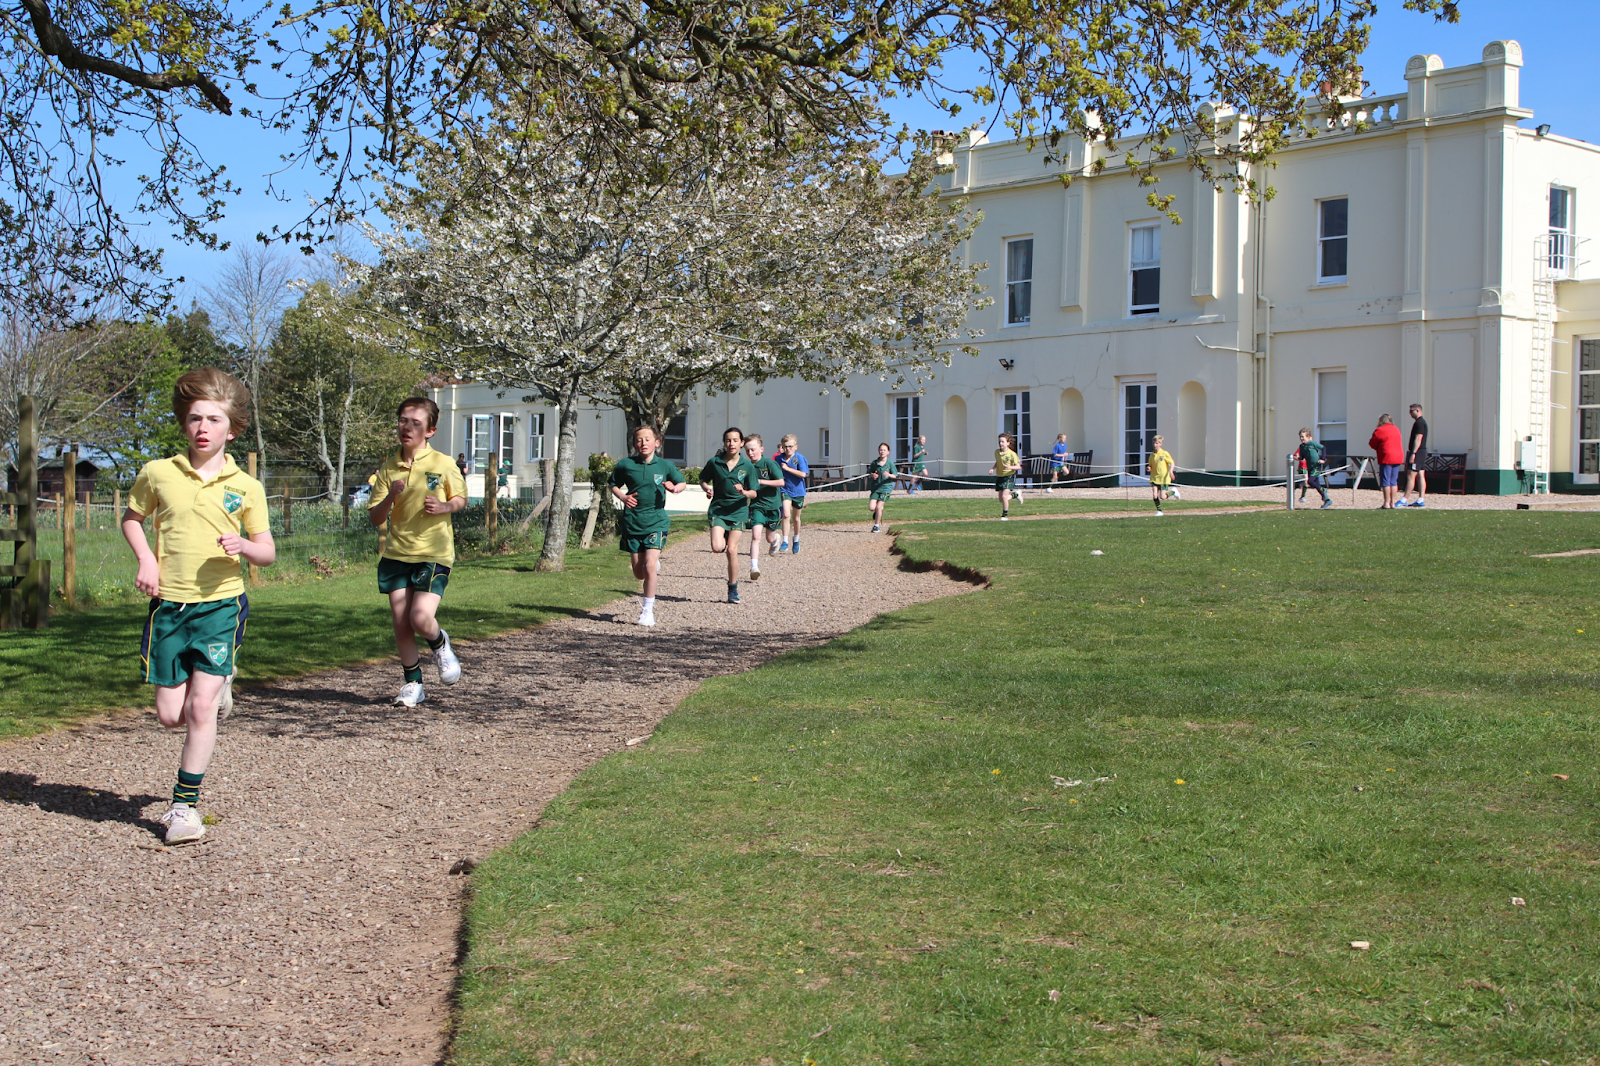 Pupils running down a school path